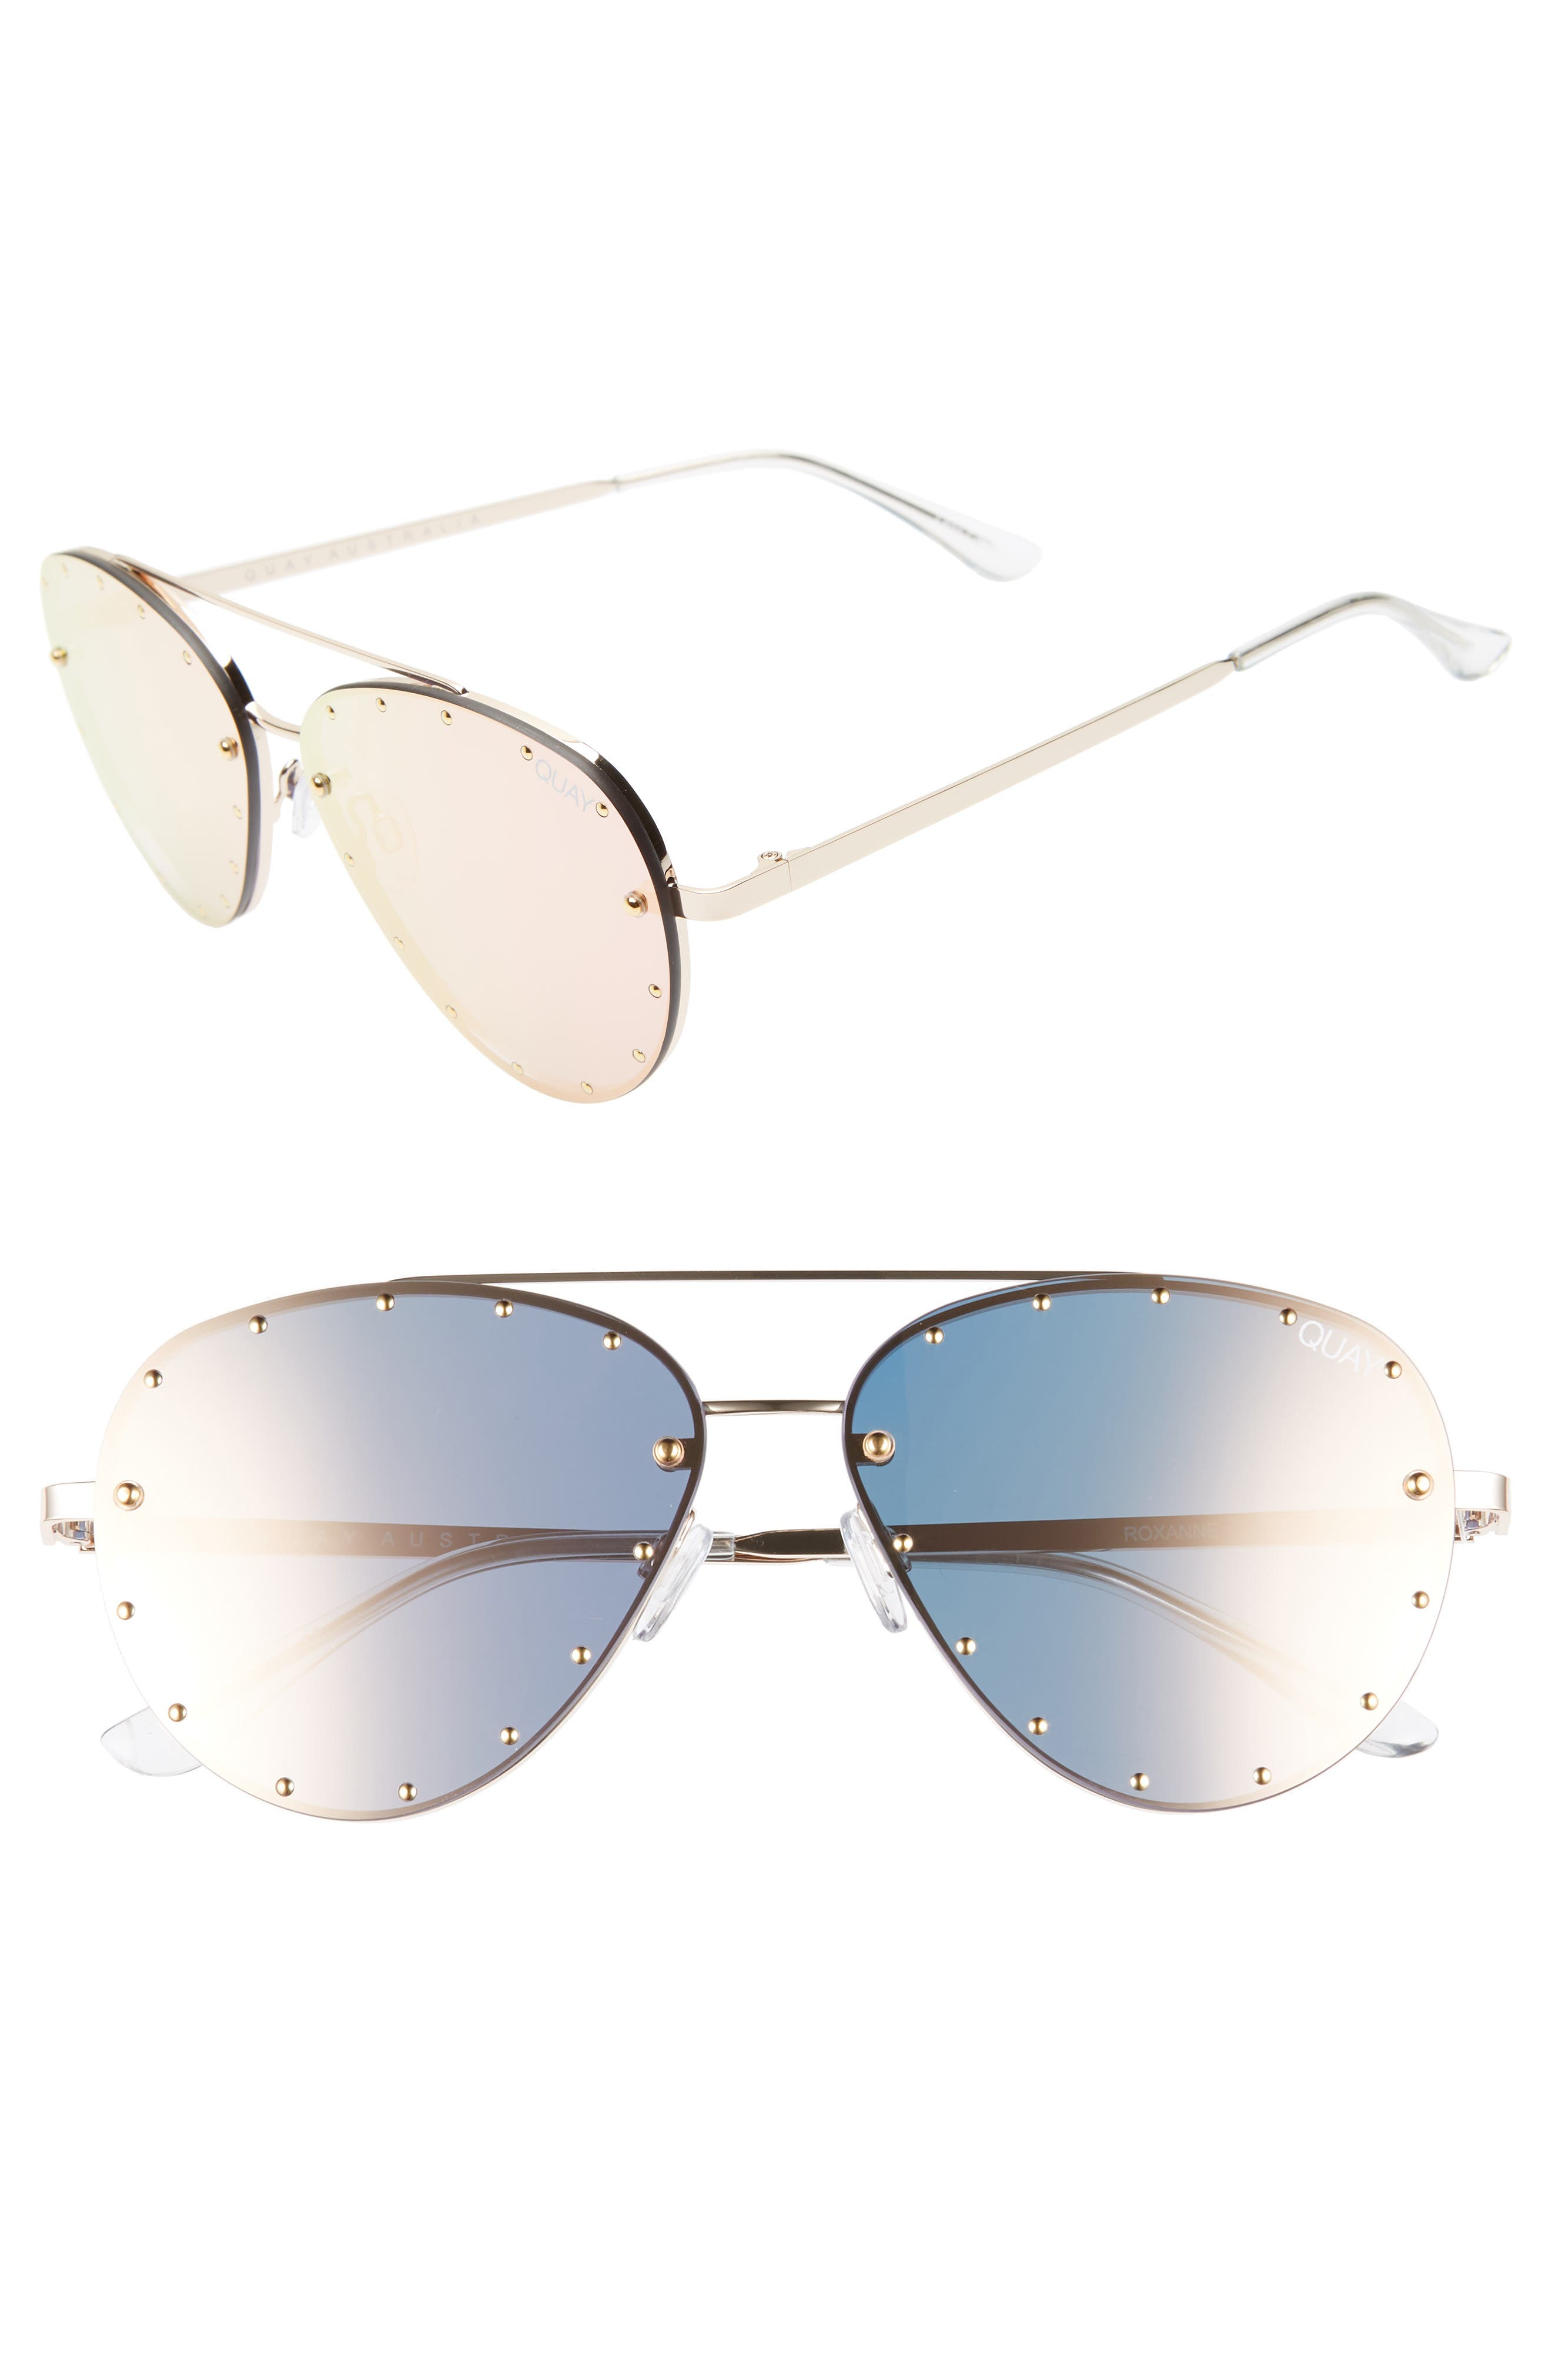 x Jaclyn Hill Roxanne 62mm Stud Aviator Sunglasses,                         Main,                         color, GOLD / ROSE